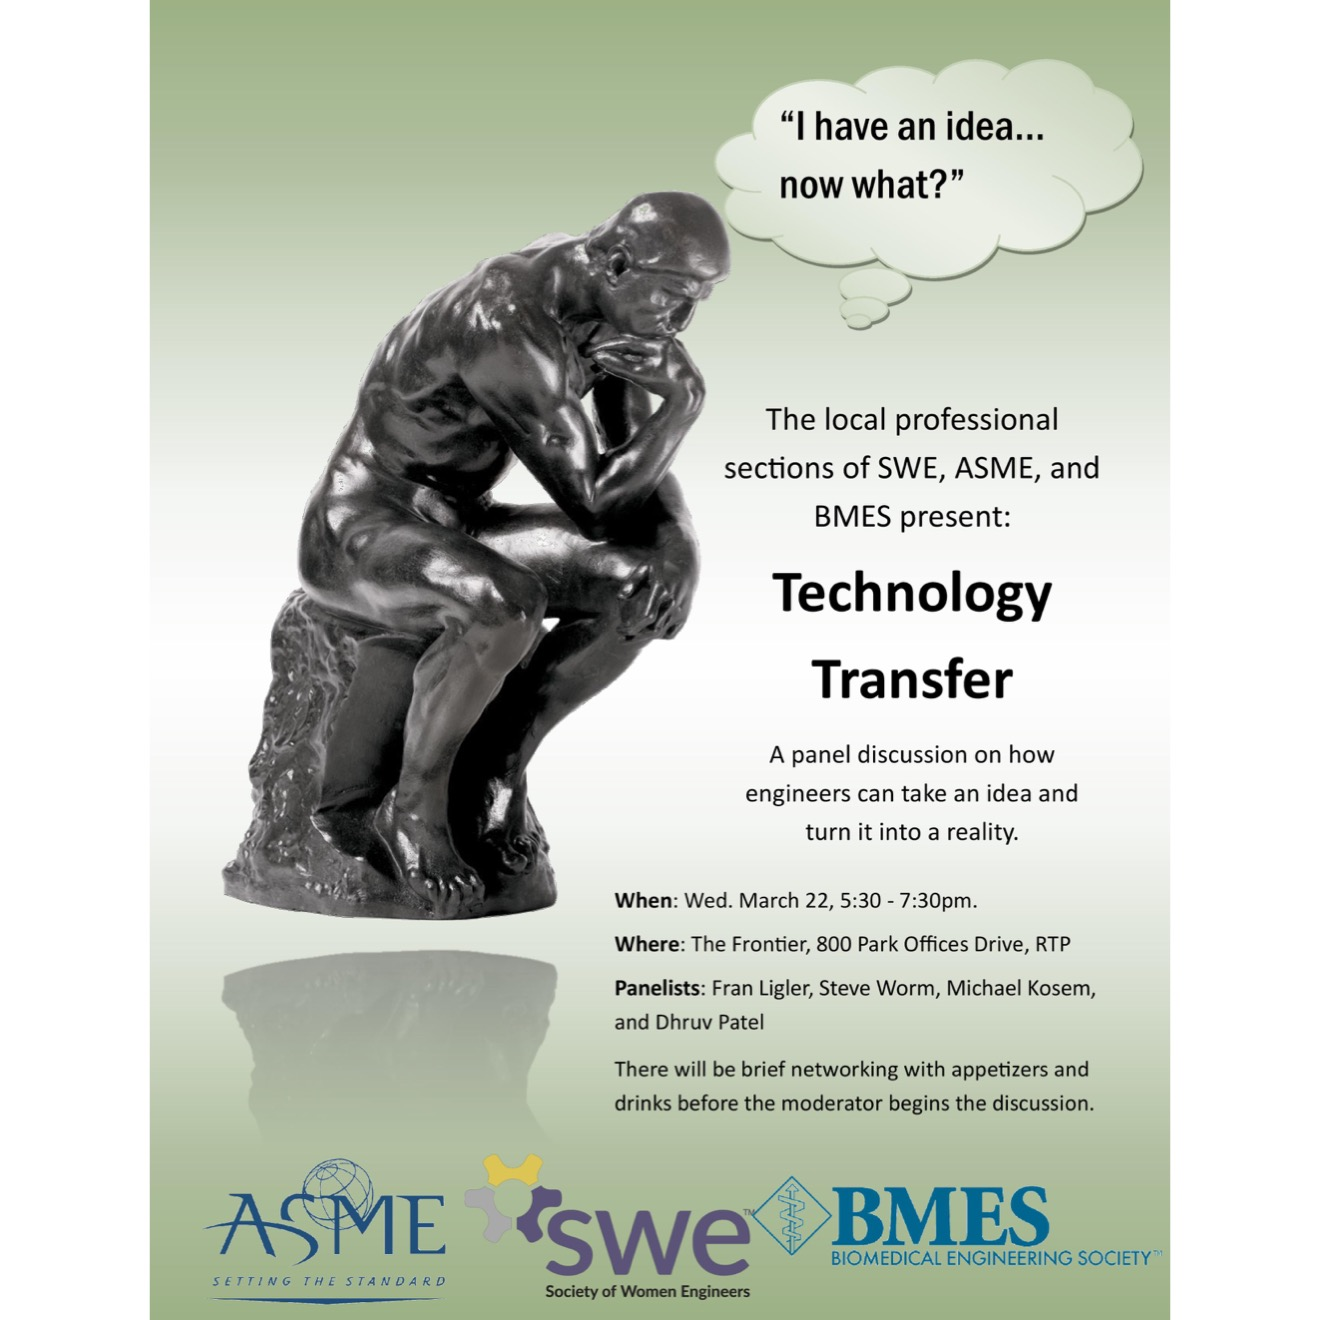 ASME, BMES, & SWE